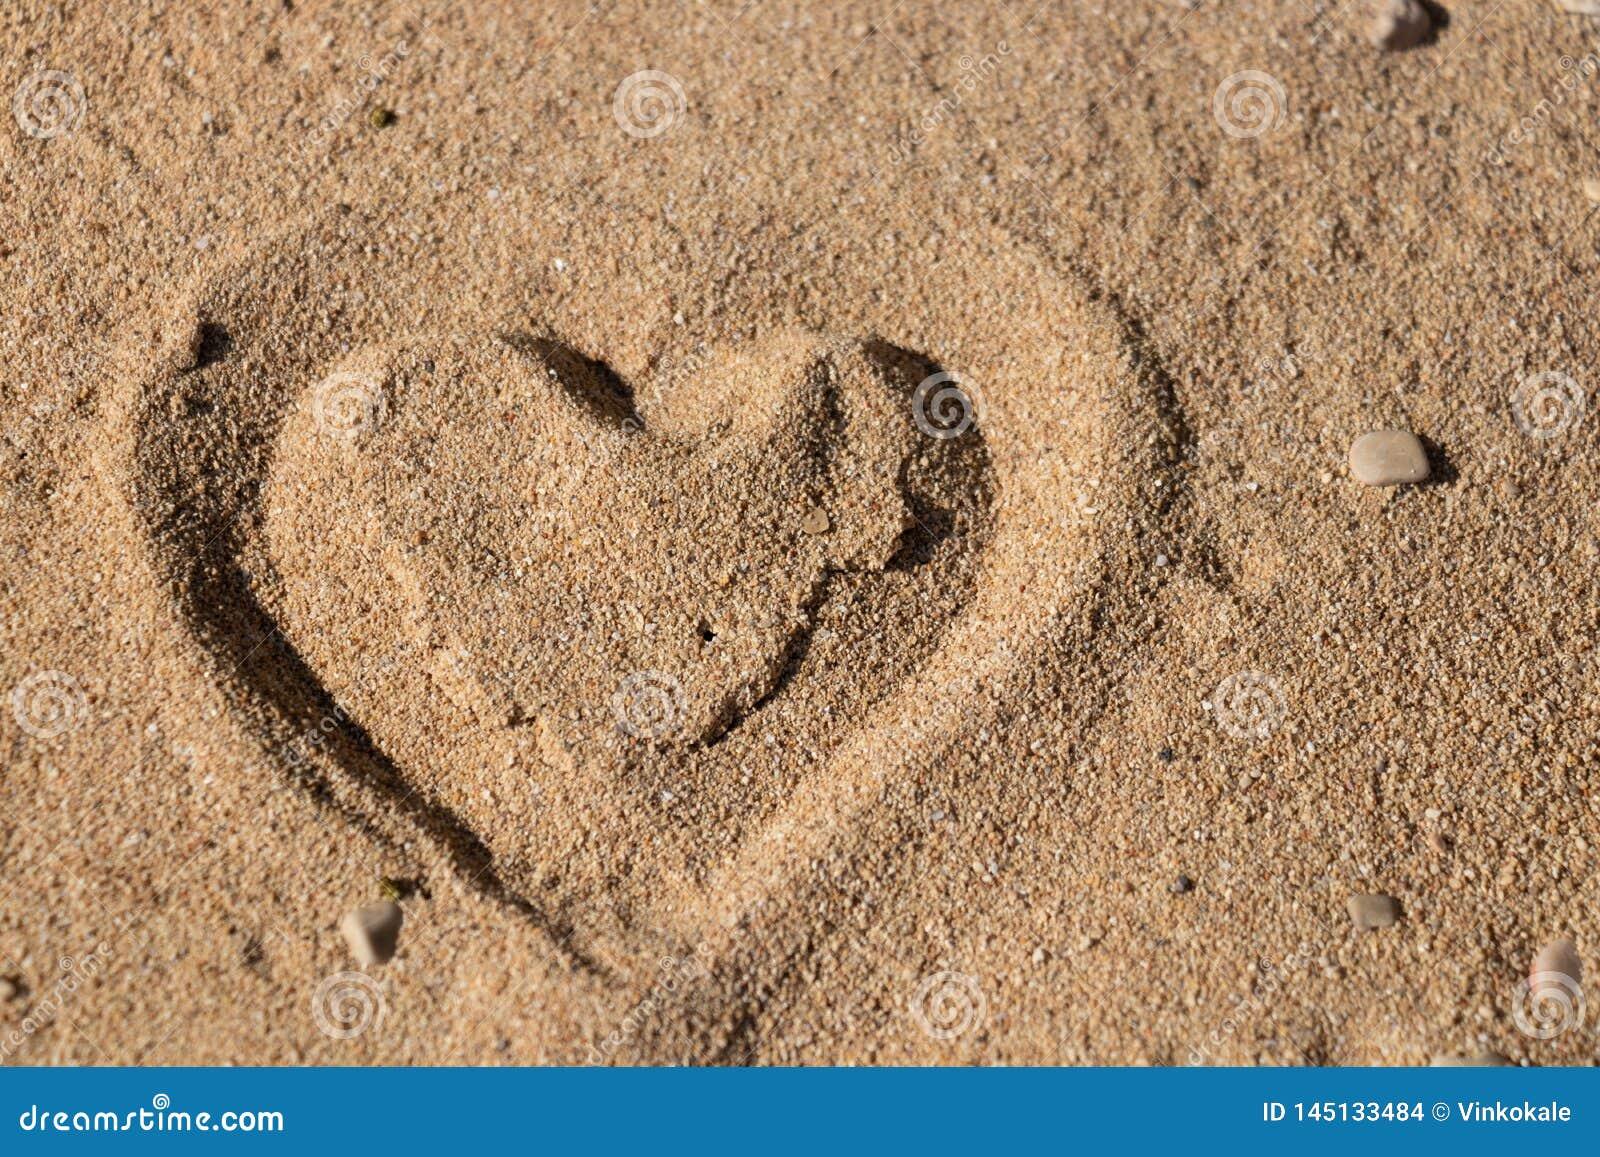 Herzform im Sand